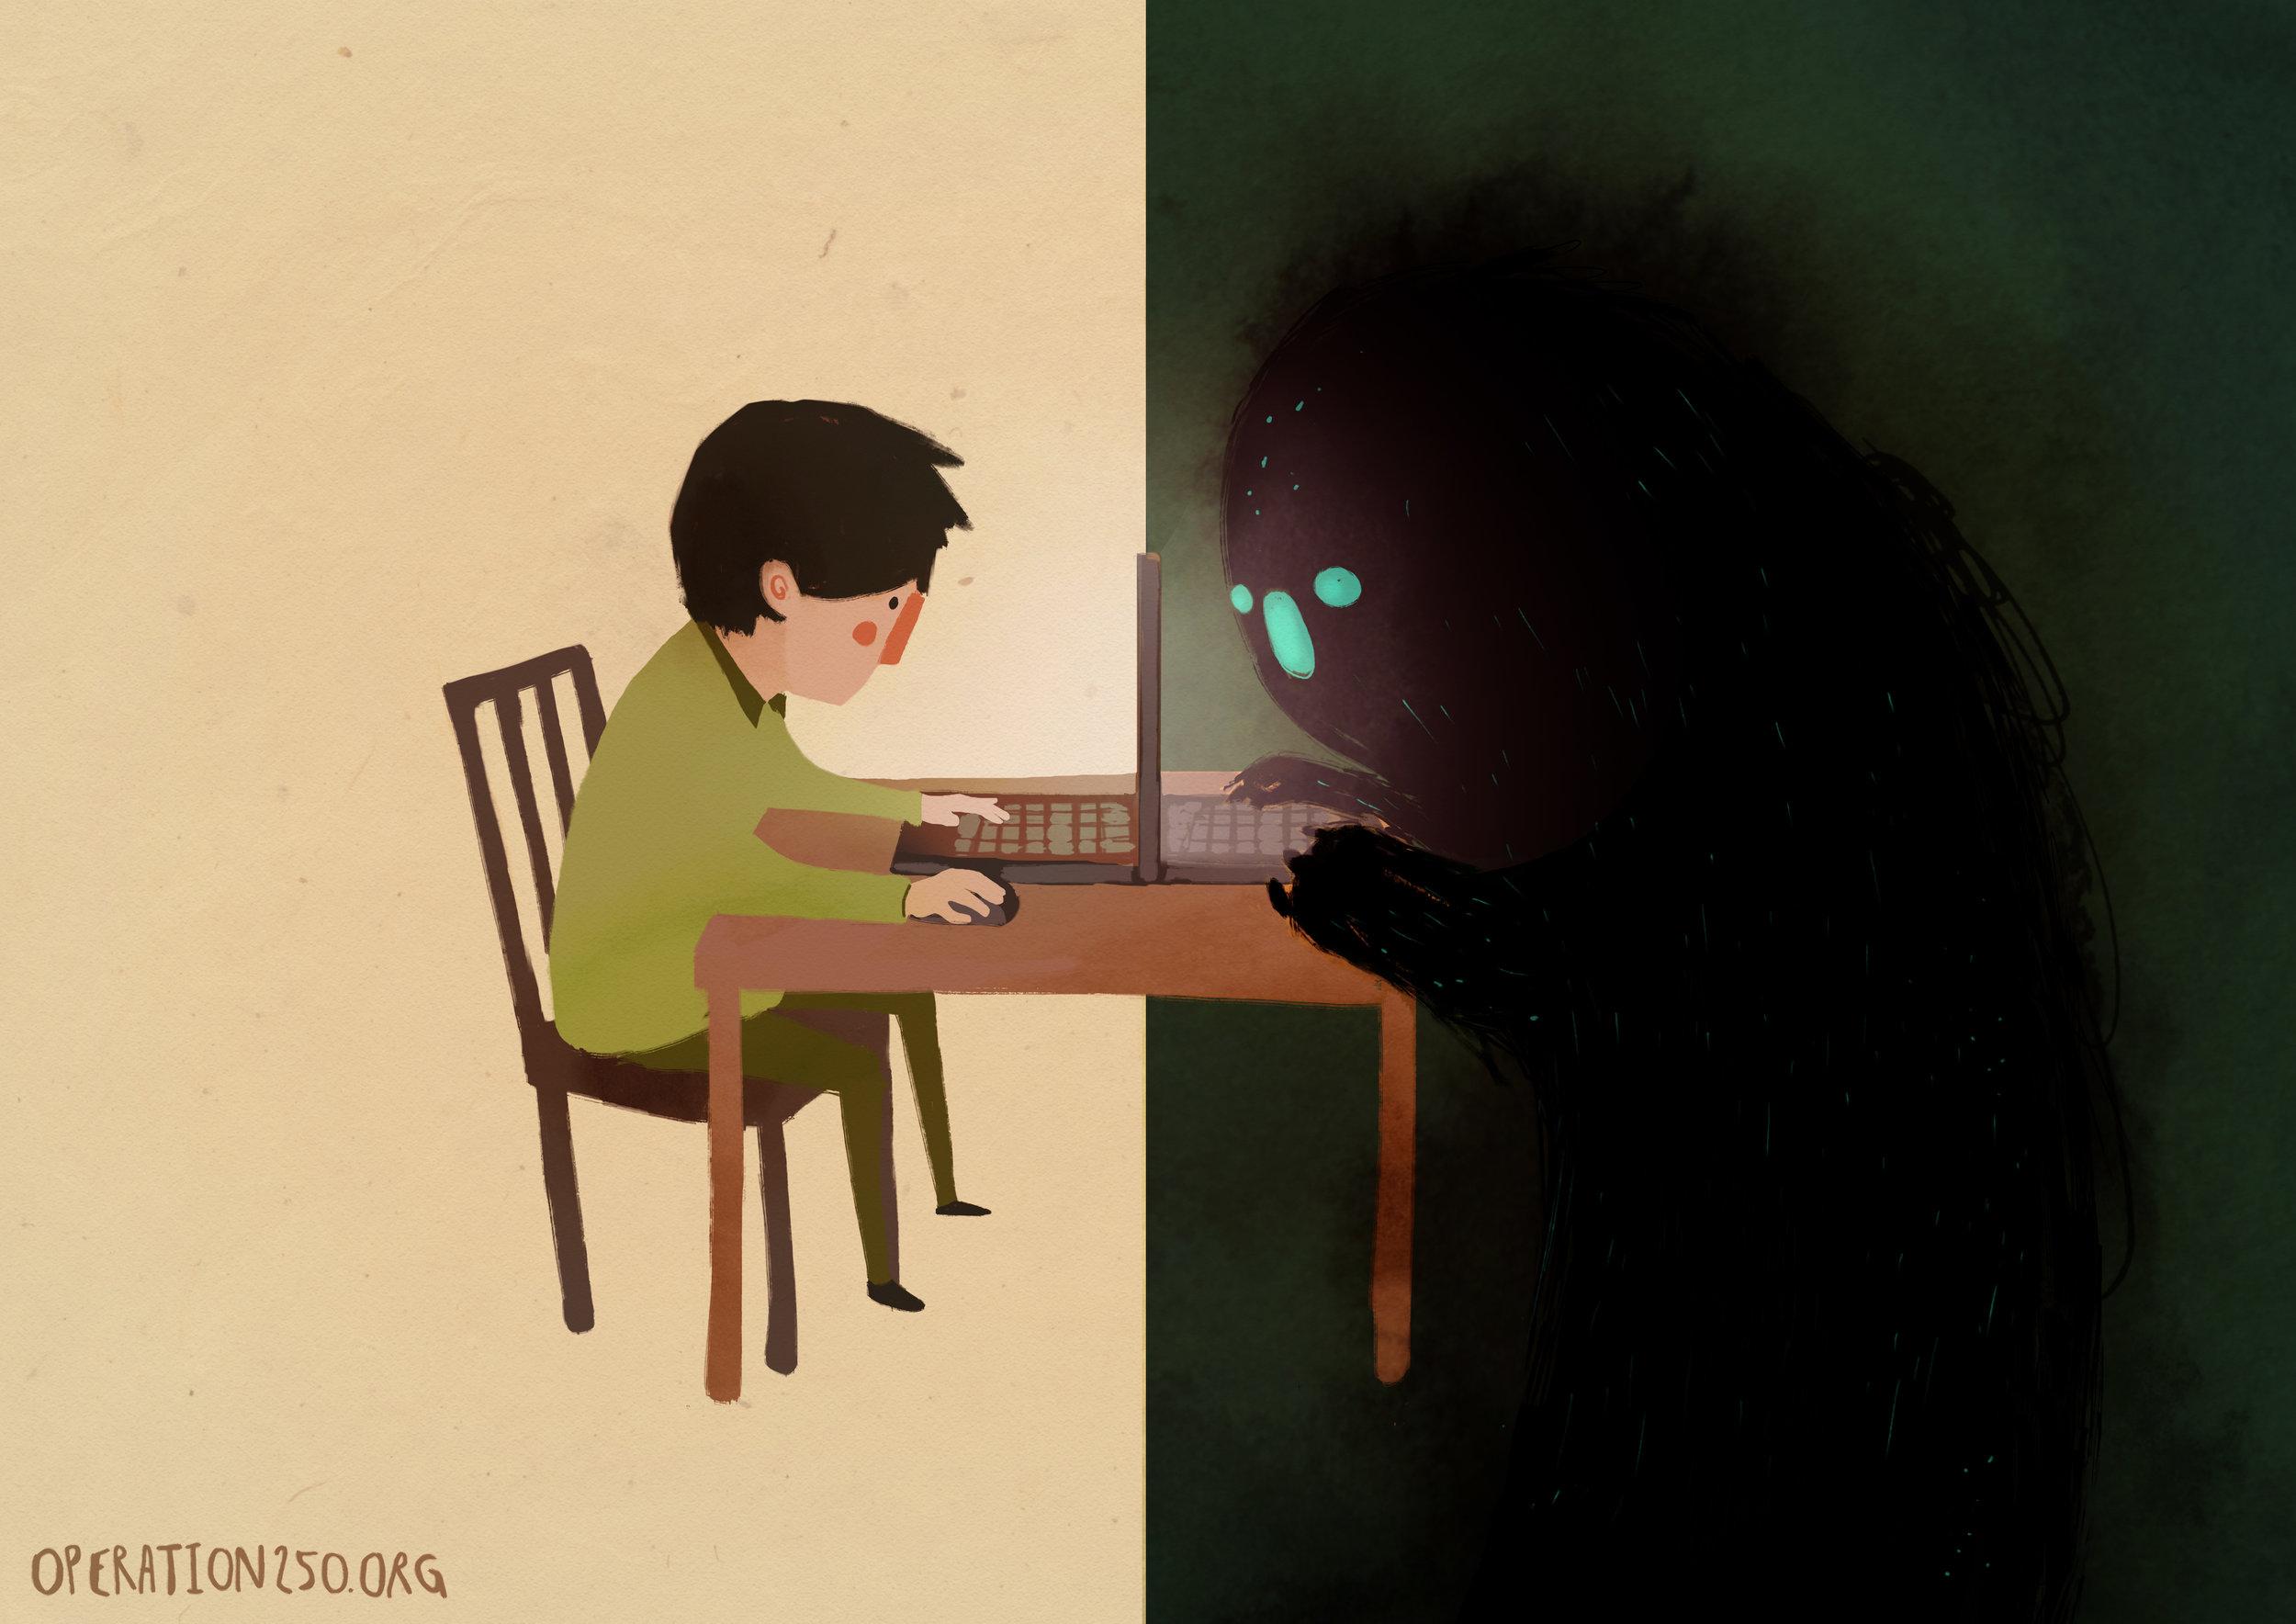 online safety illustration.jpg